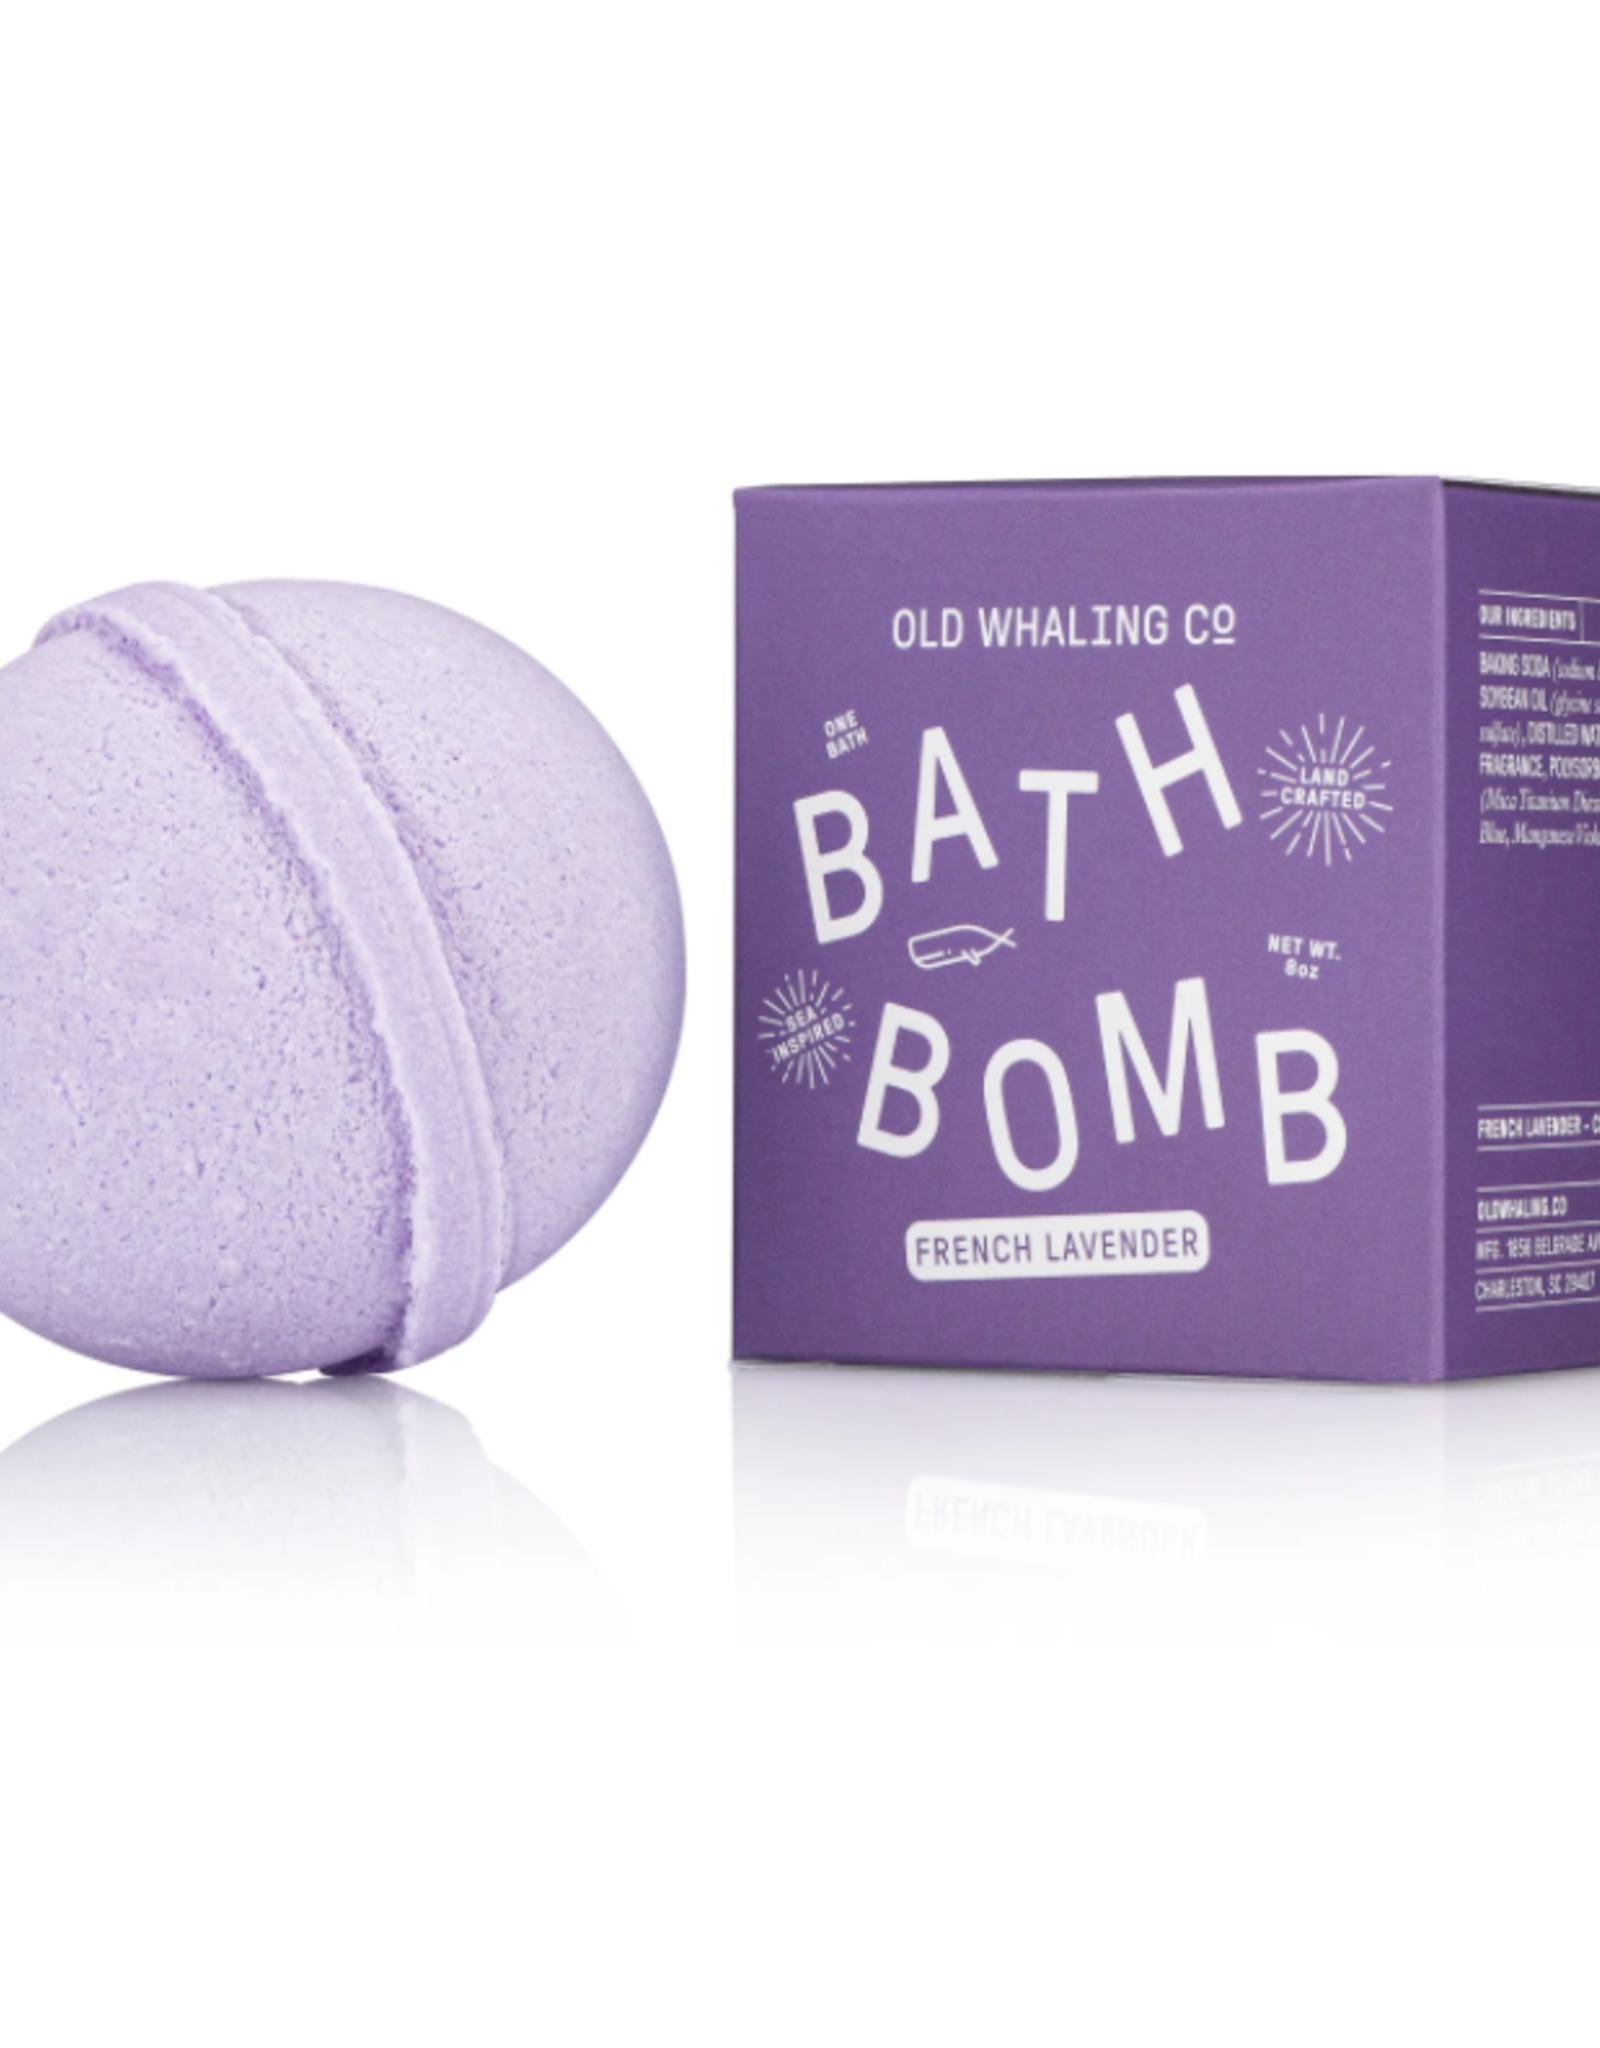 French Lavender Bath Bomb